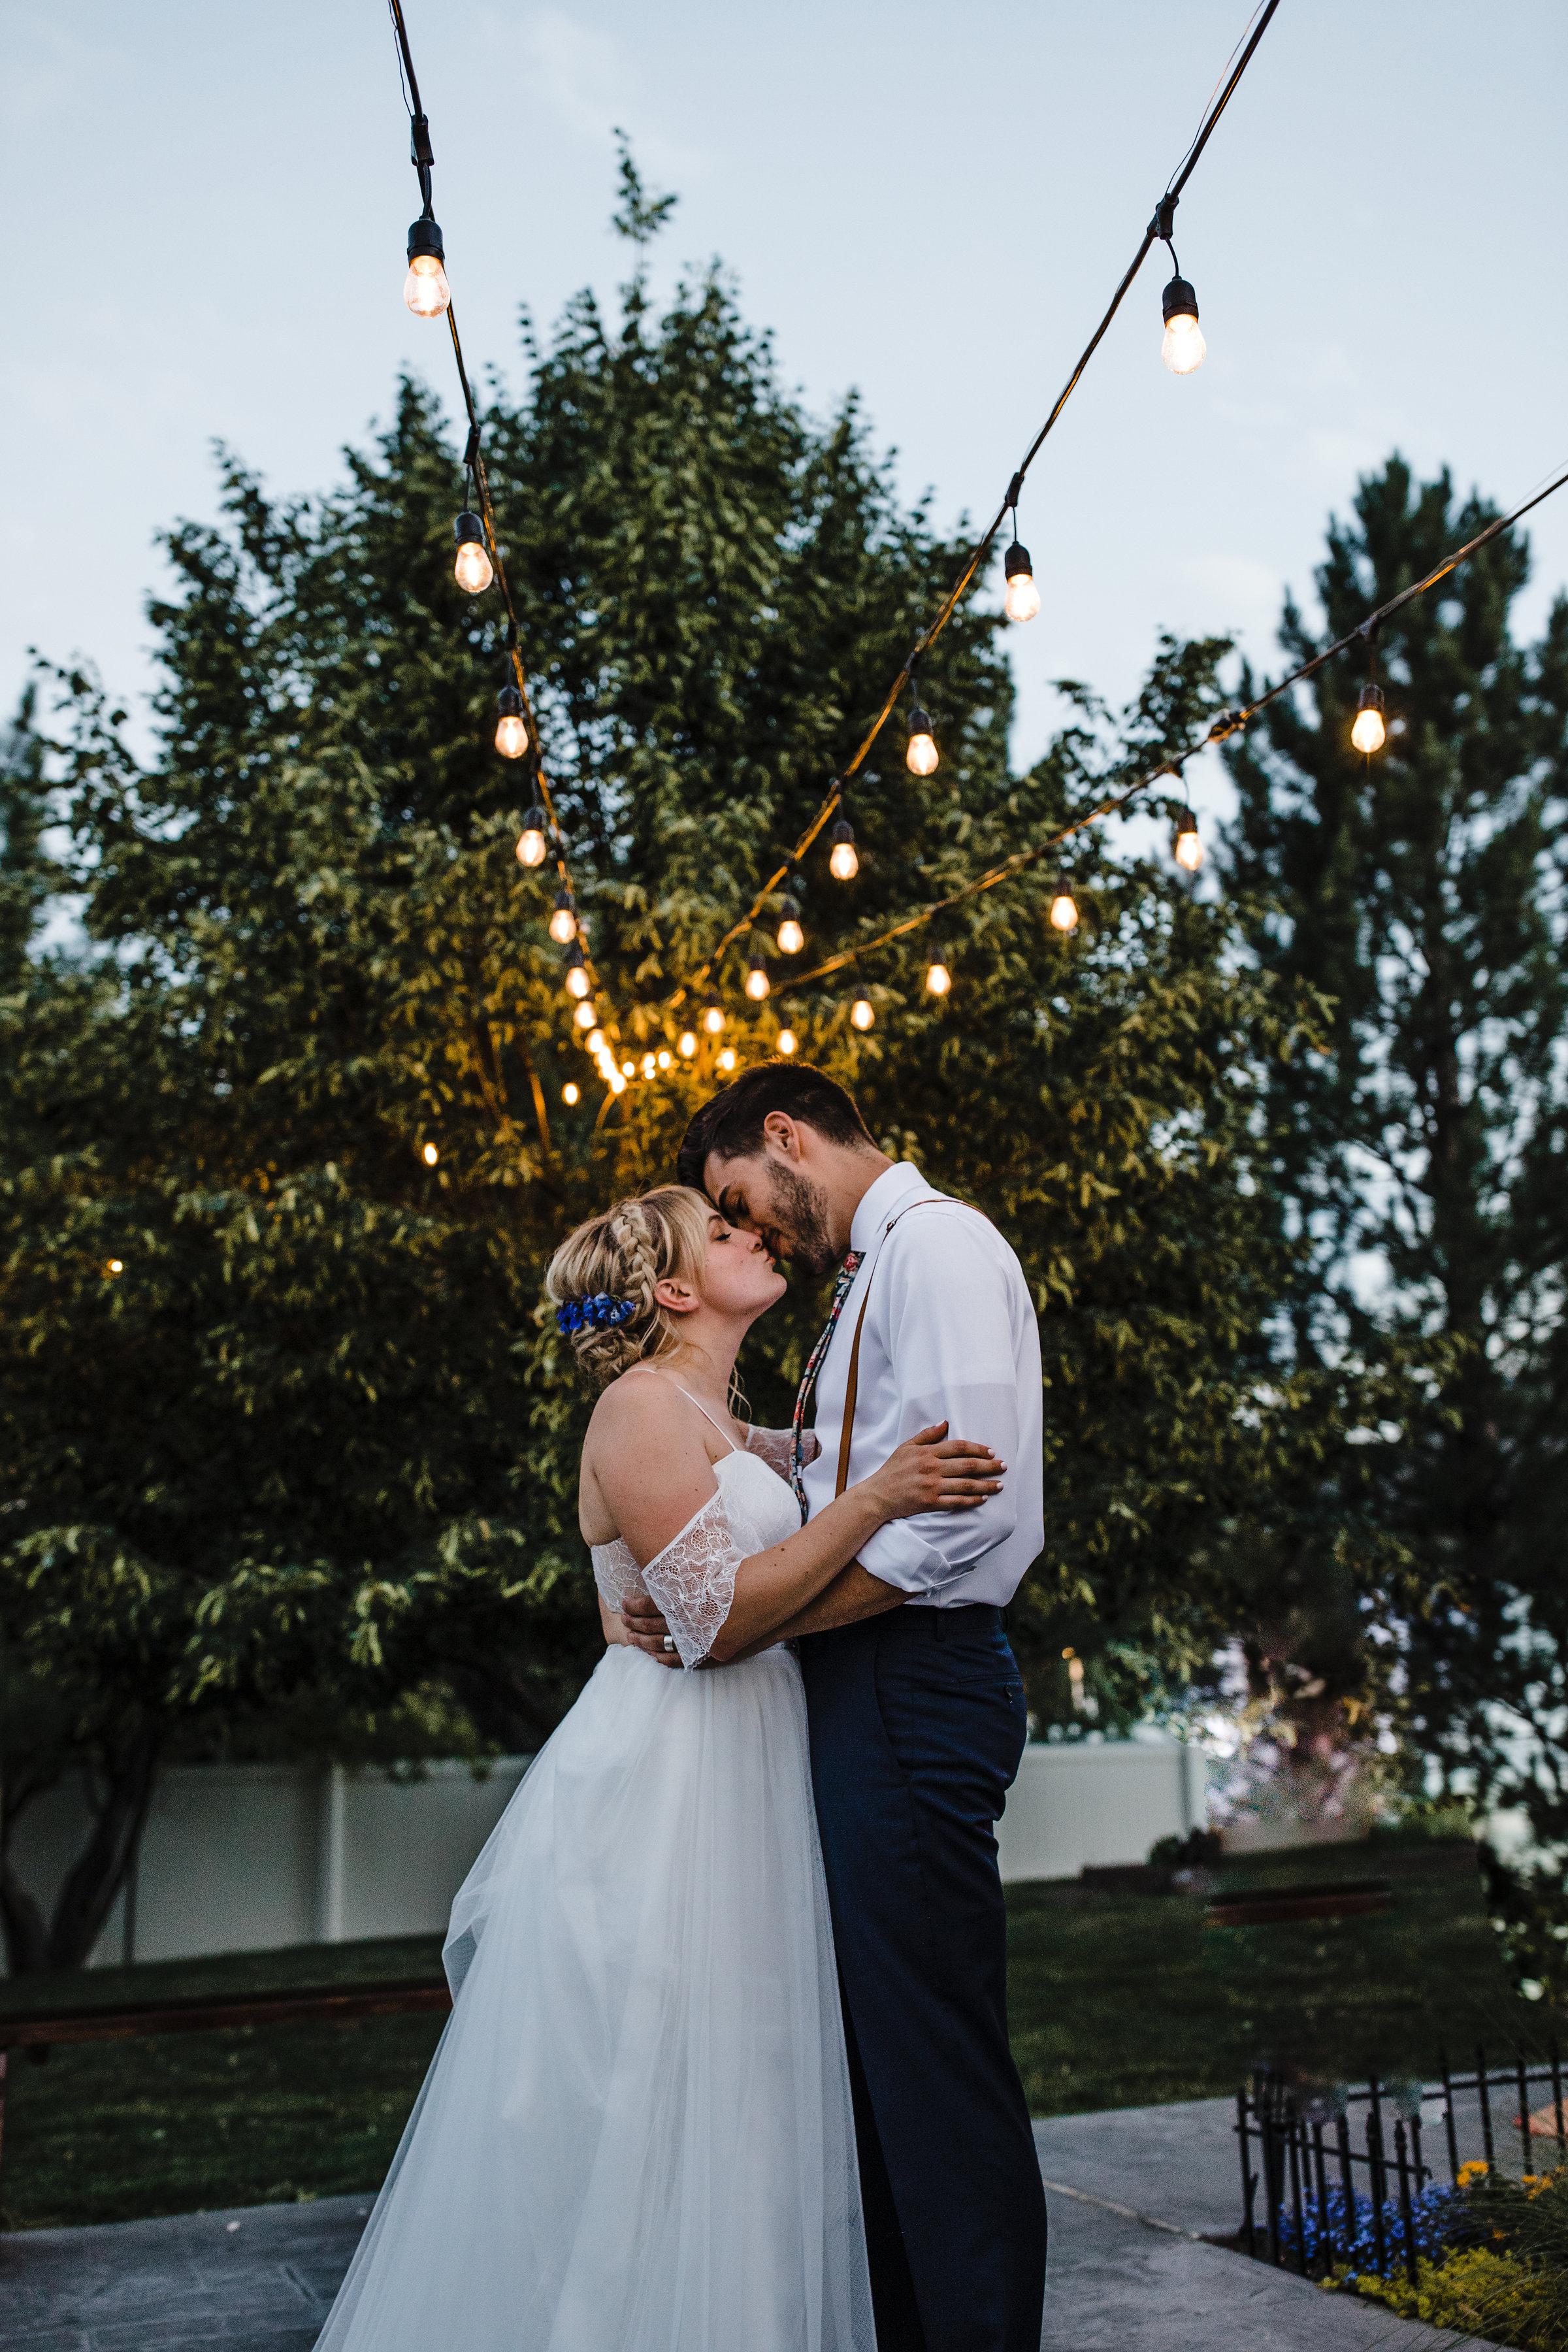 south jordan utah professional photographer first dance outdoor bohemian wedding string lights smiling romantic